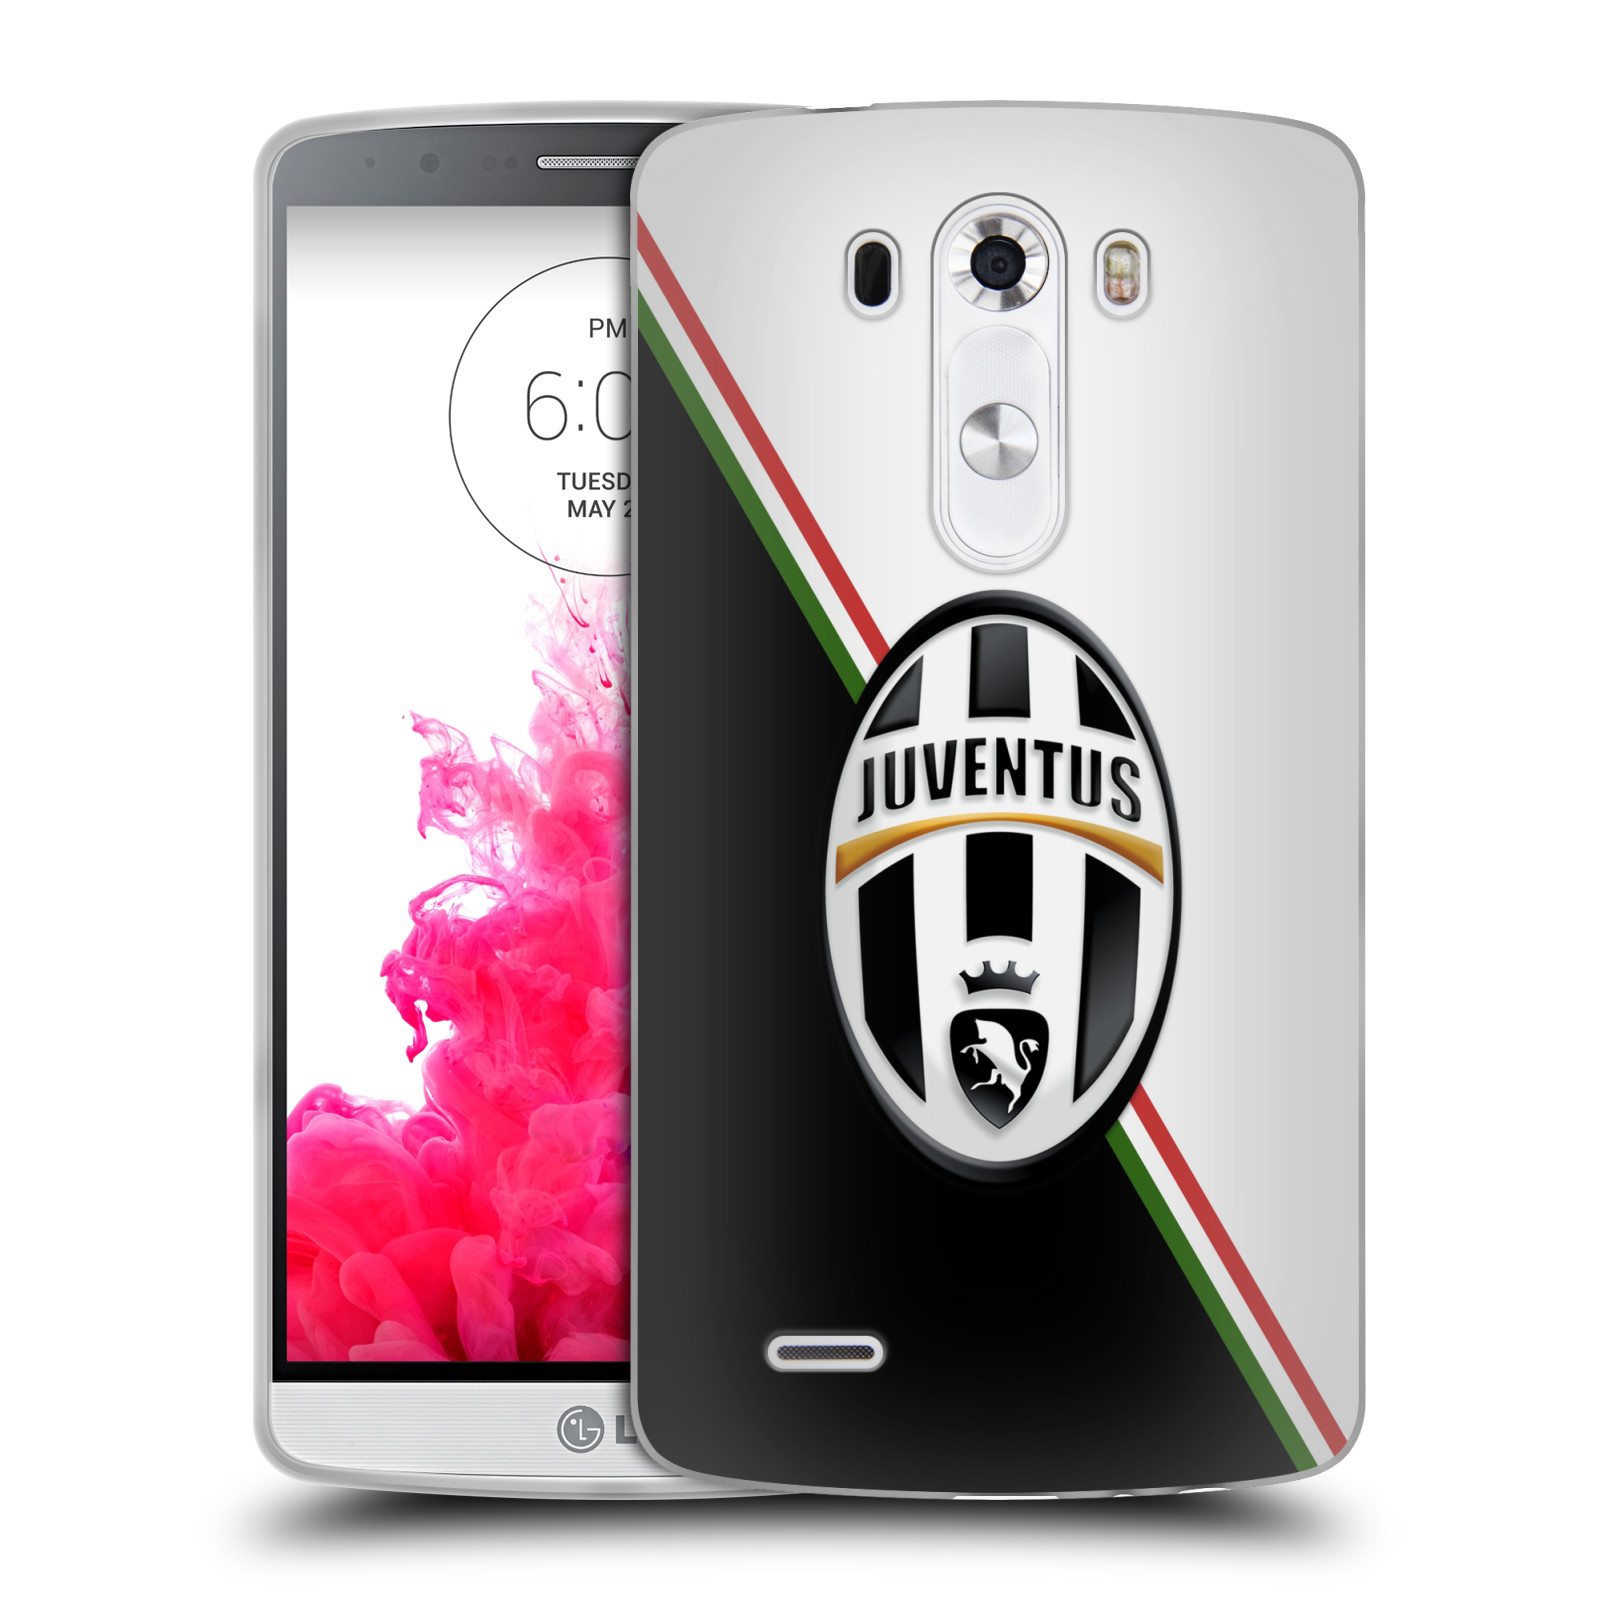 Silikonové pouzdro na mobil LG G3 HEAD CASE Juventus FC - Black and White (Silikonový kryt či obal na mobilní telefon Juventus FC Official pro LG G3)